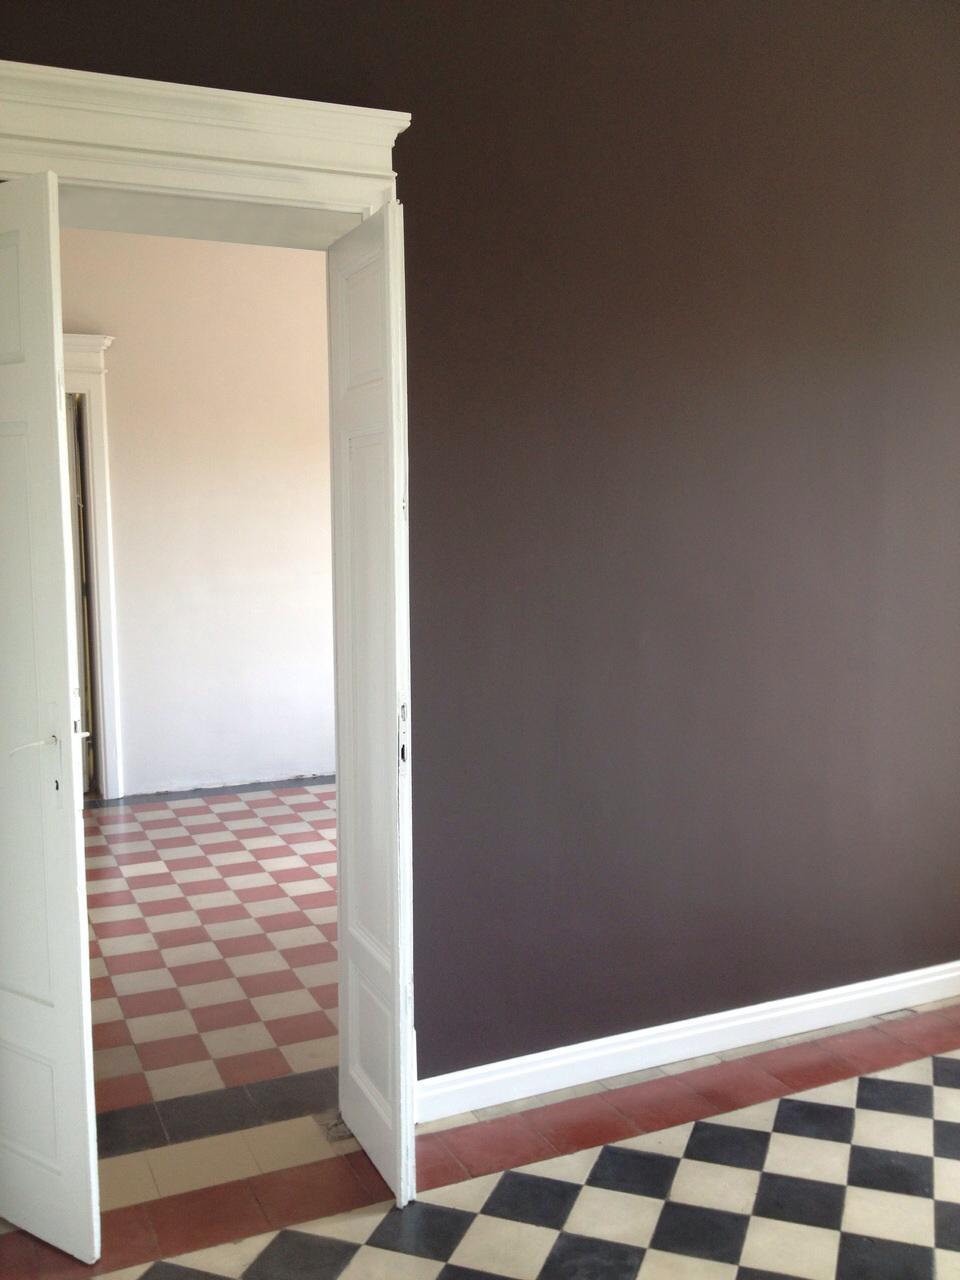 Tag rinnovare casa for Rinnovare casa low cost